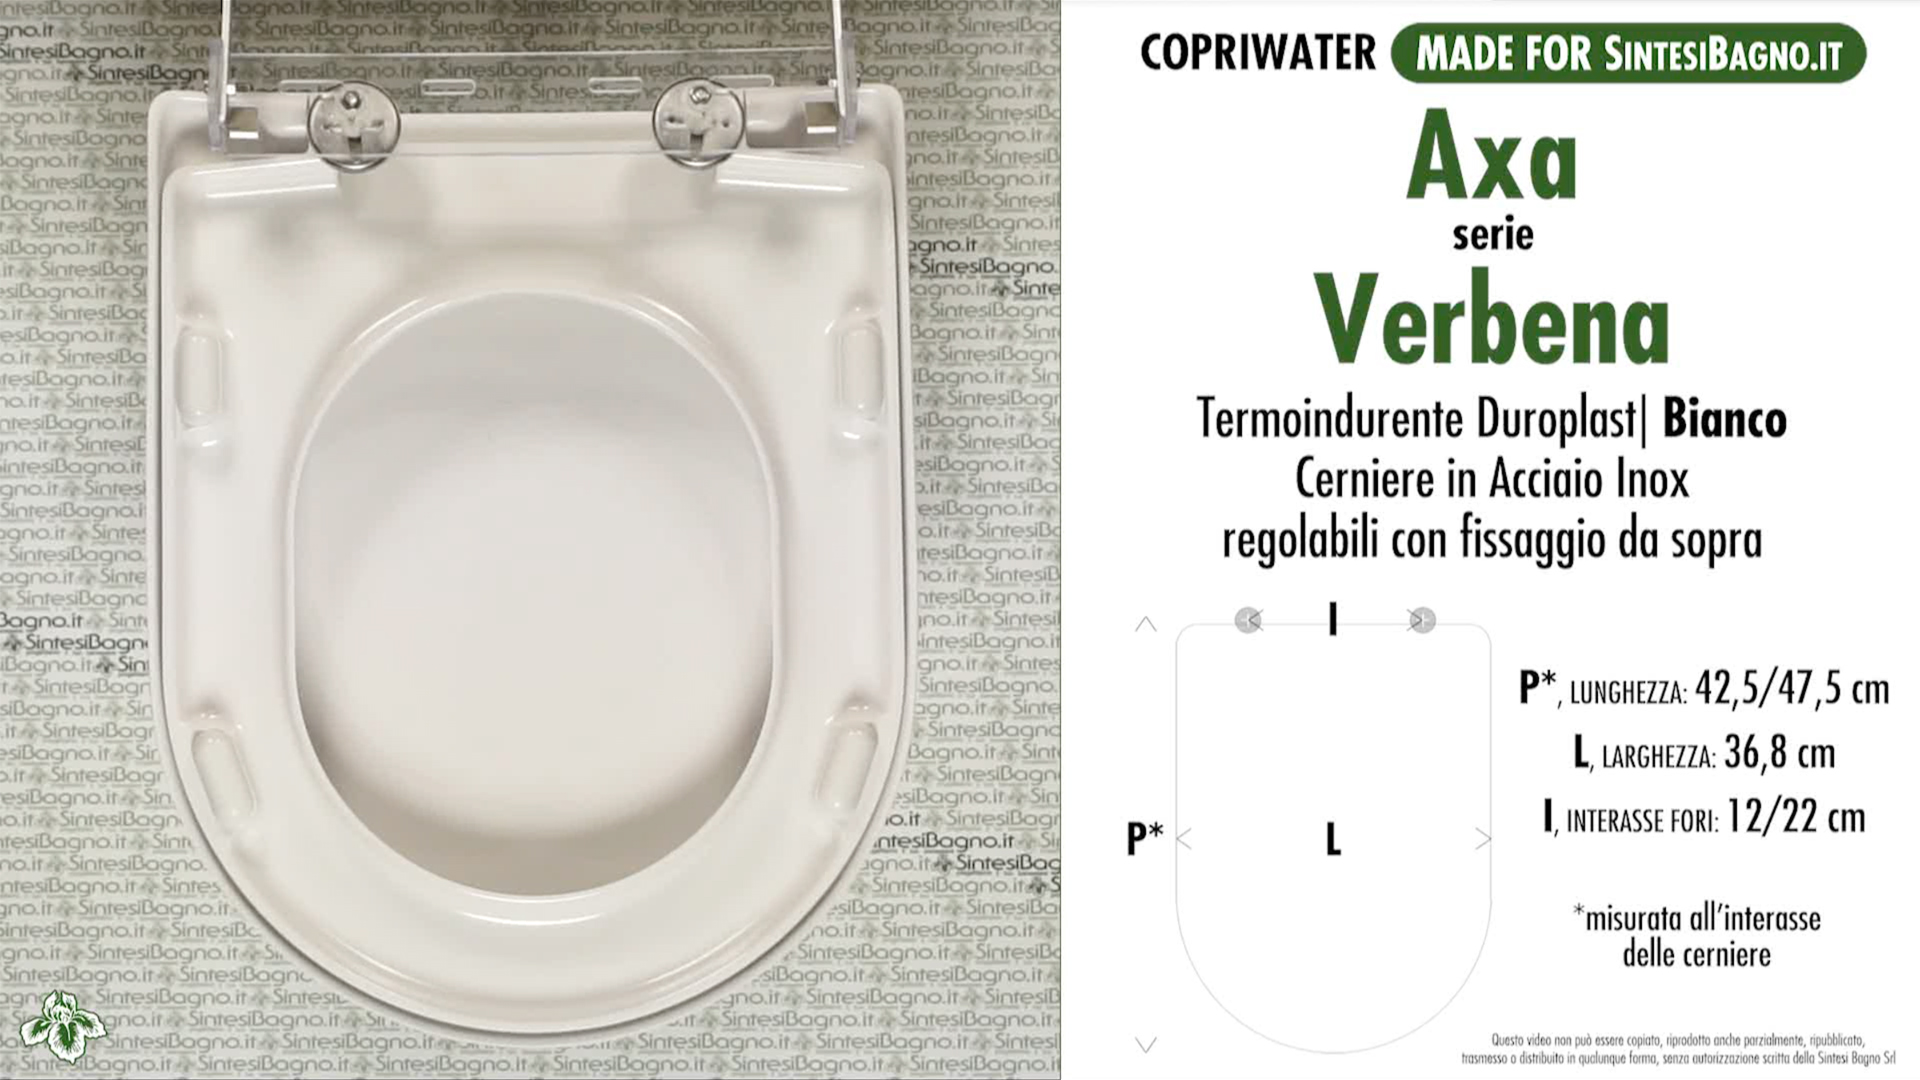 SCHEDA TECNICA MISURE copriwater AXA VERBENA